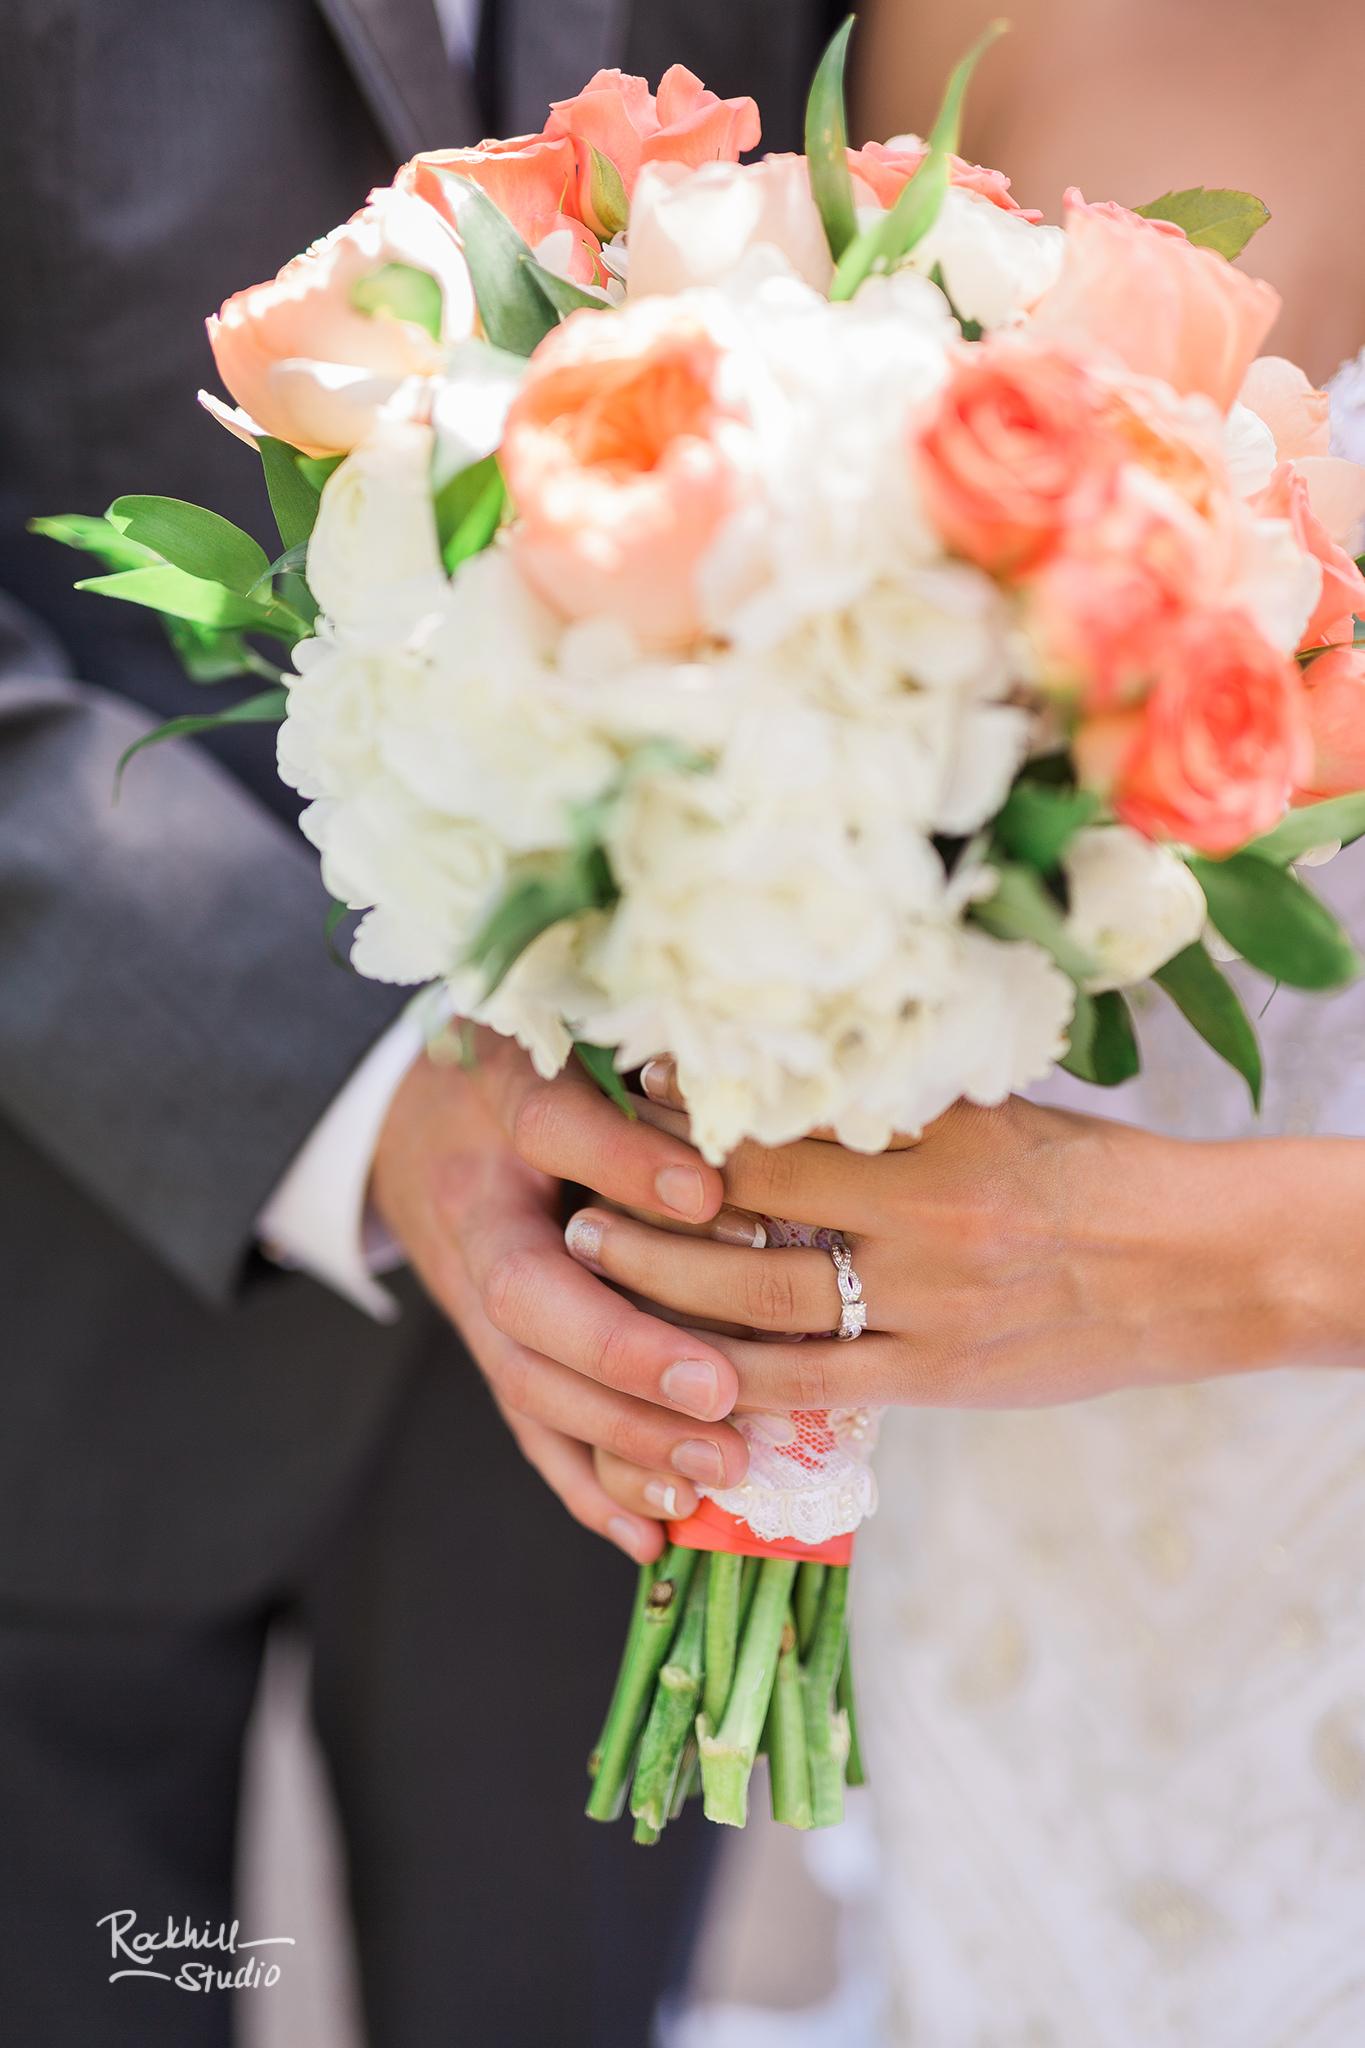 marquette-wedding-upper-peninsula-northern-michigan-wedding-ck-photography-wedding-party-3.jpg